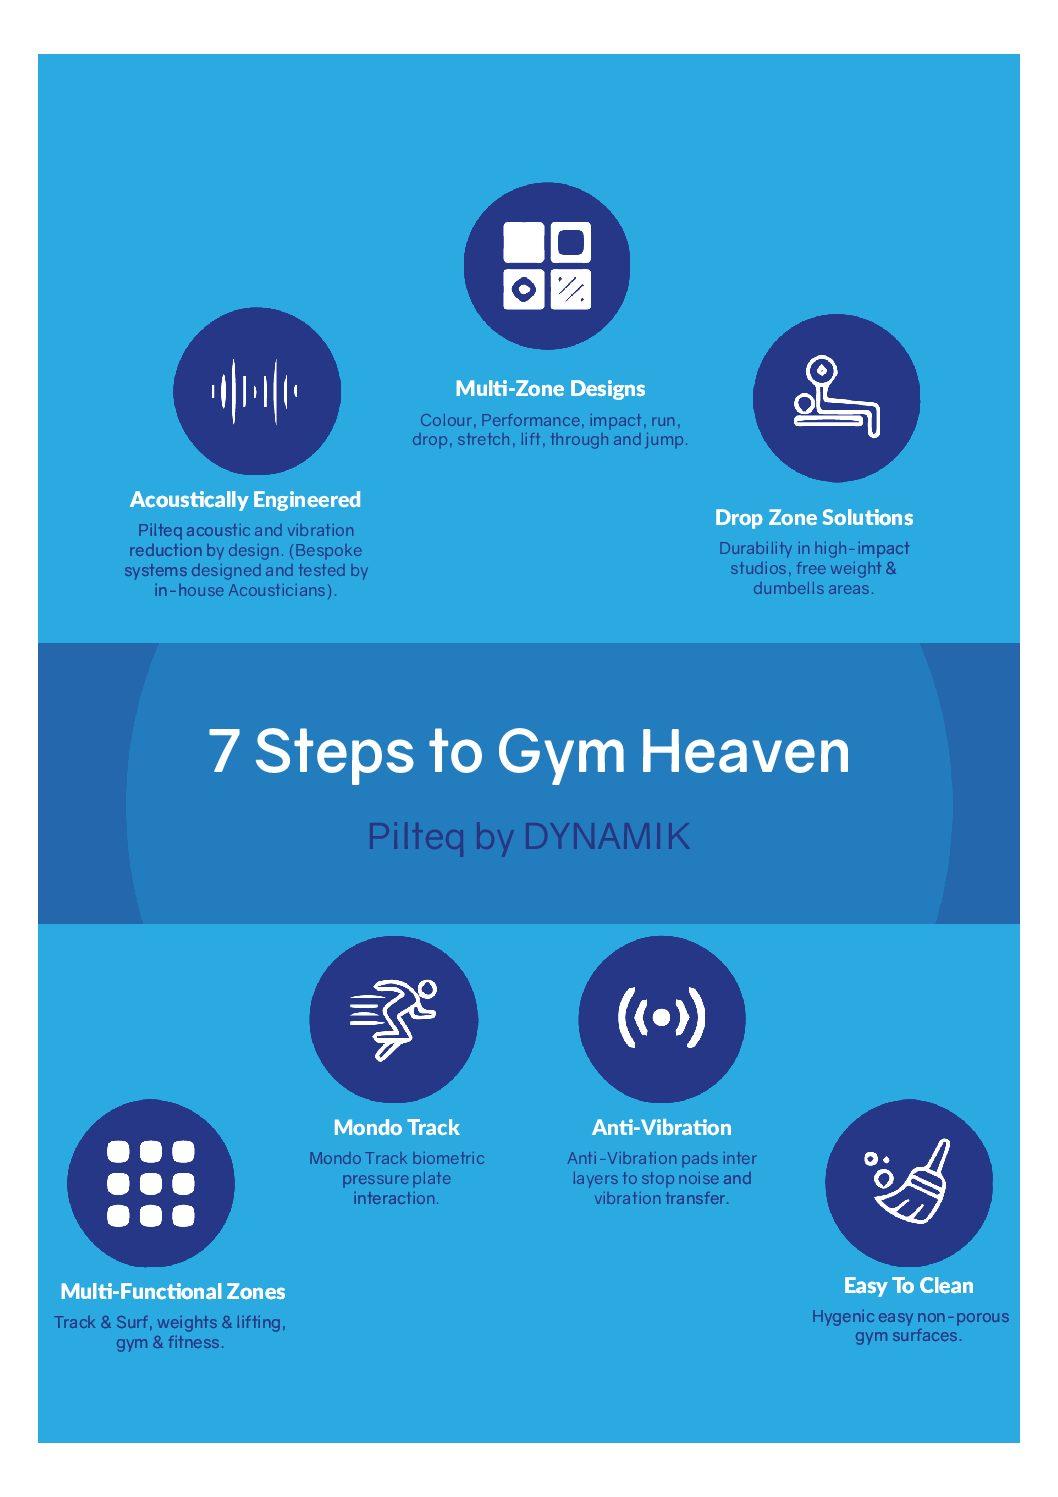 7 steps to gym heaven